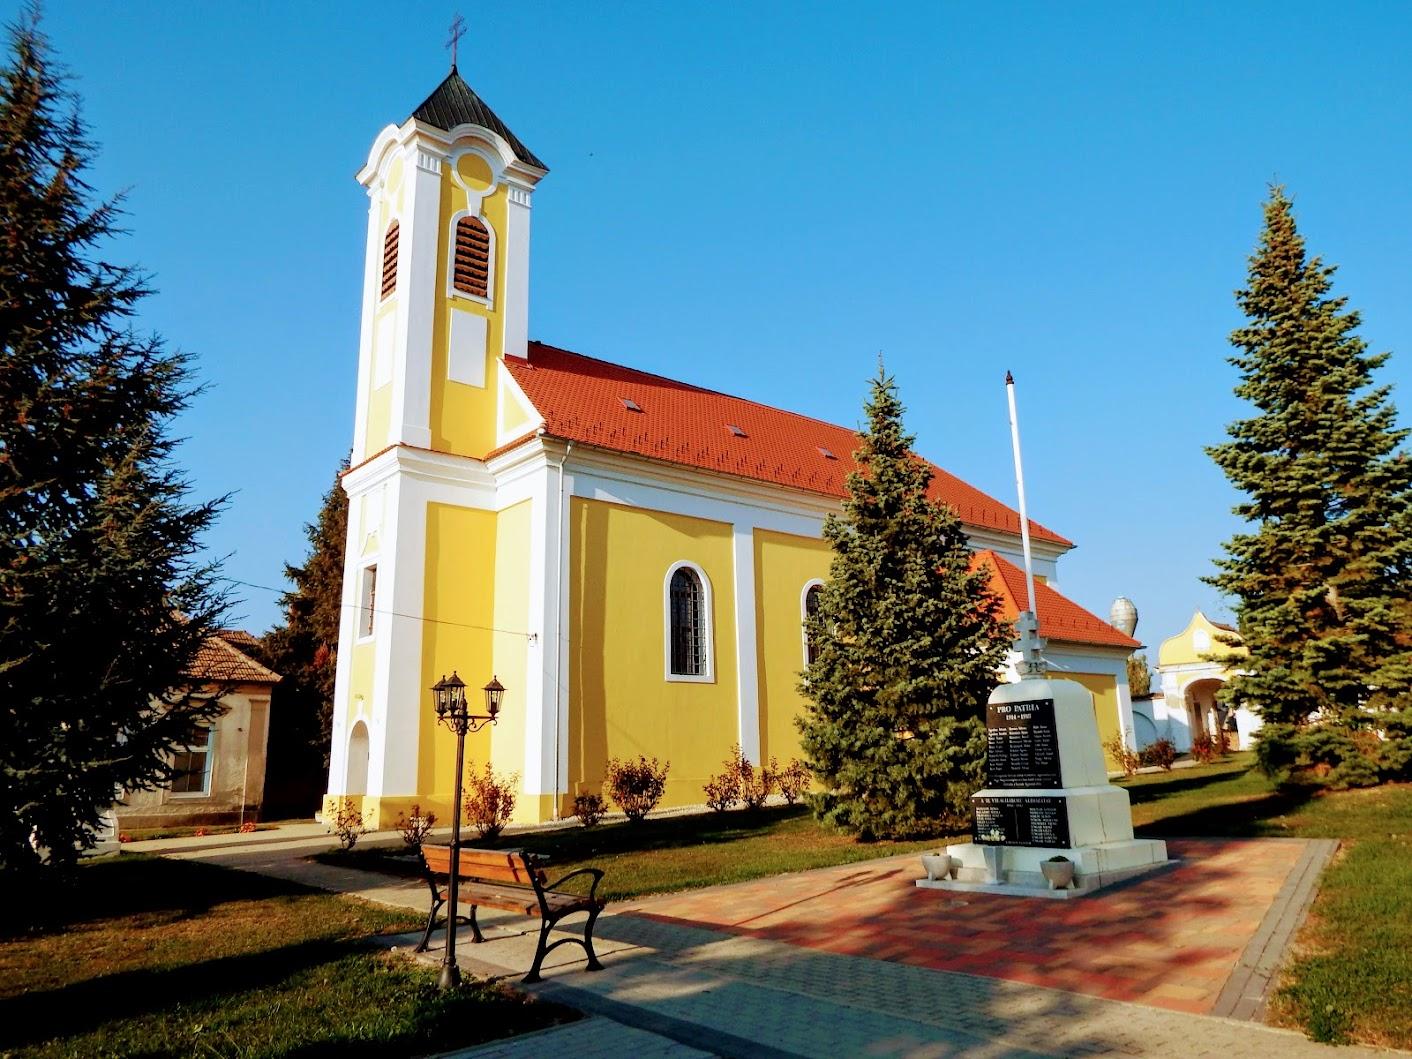 Simaság - Bűnbűnó Magdolna rk. templom